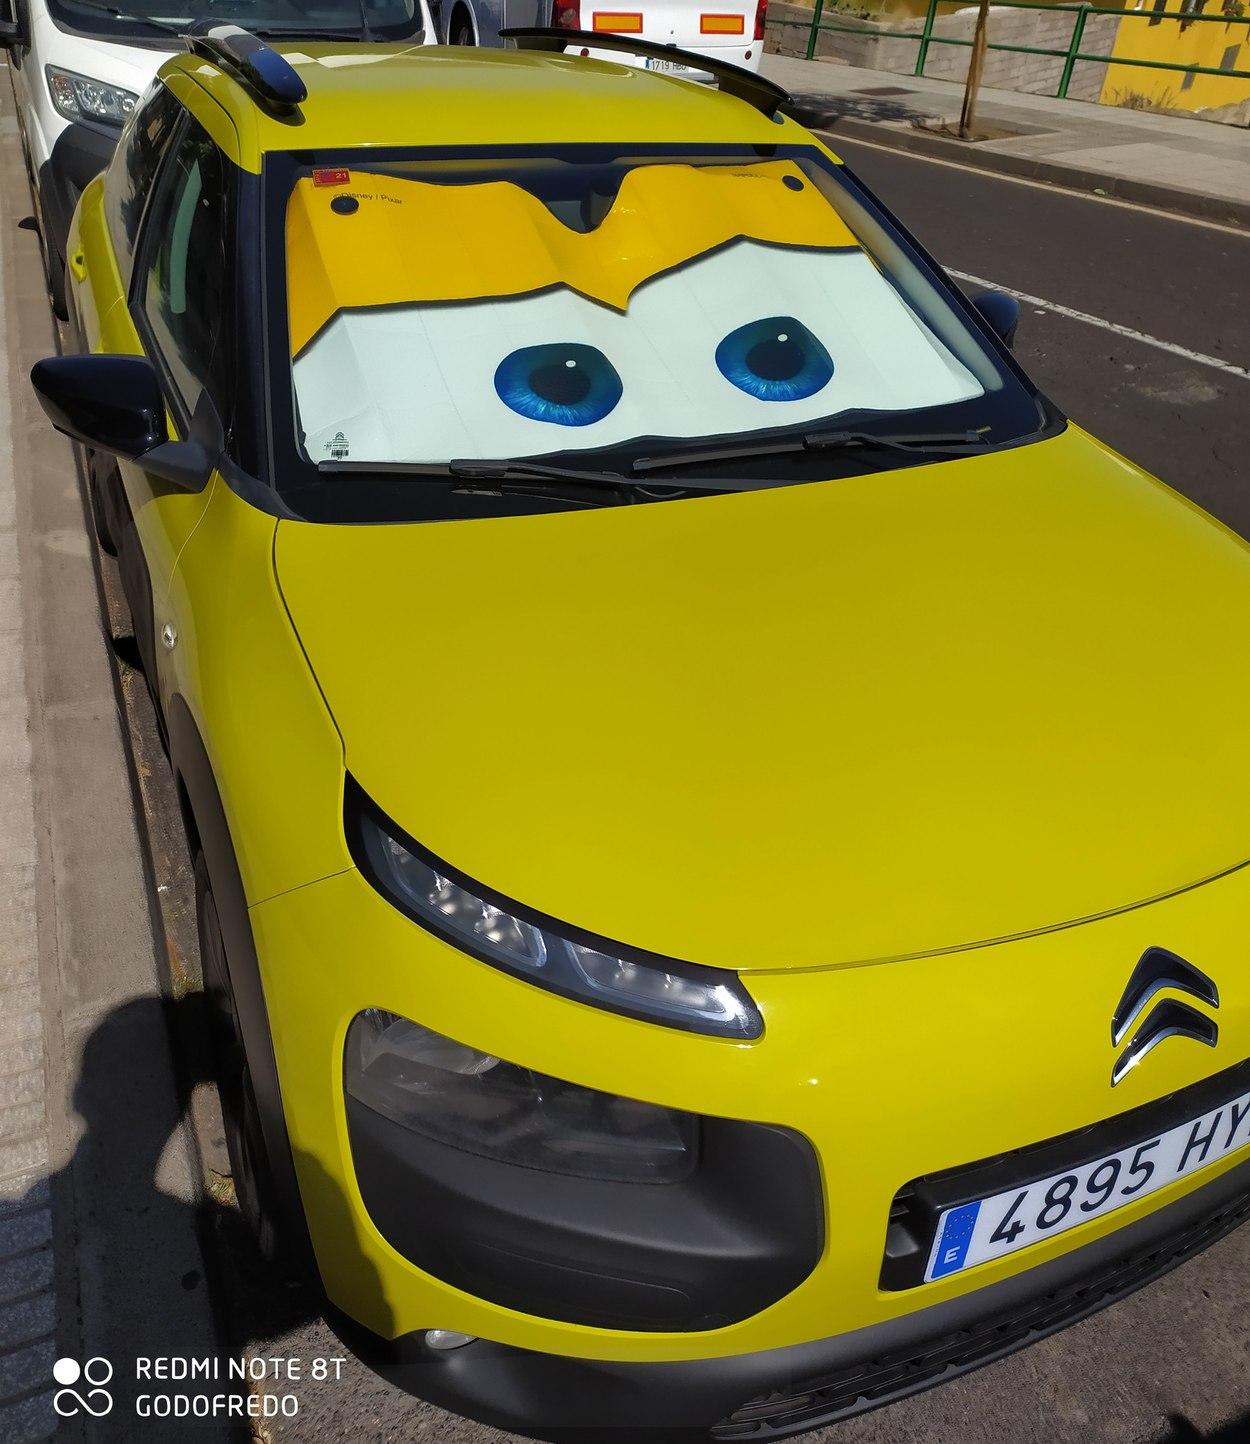 Cars en la vida real - meme